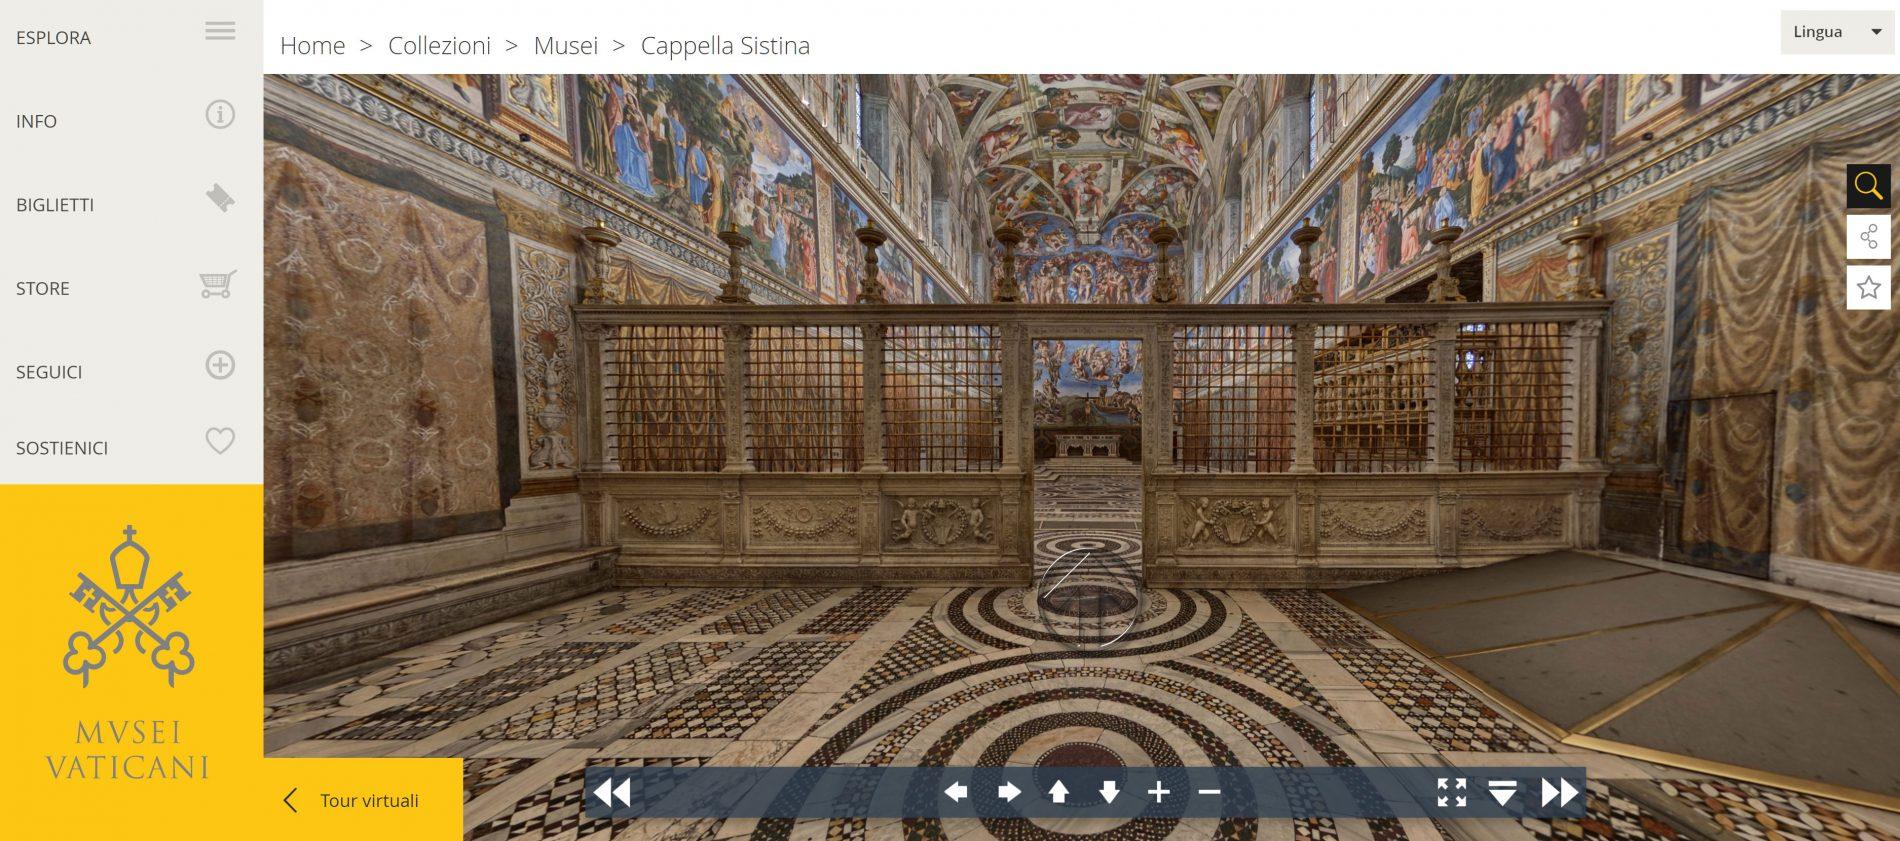 musei vaticani cappella sistina tour virtuale